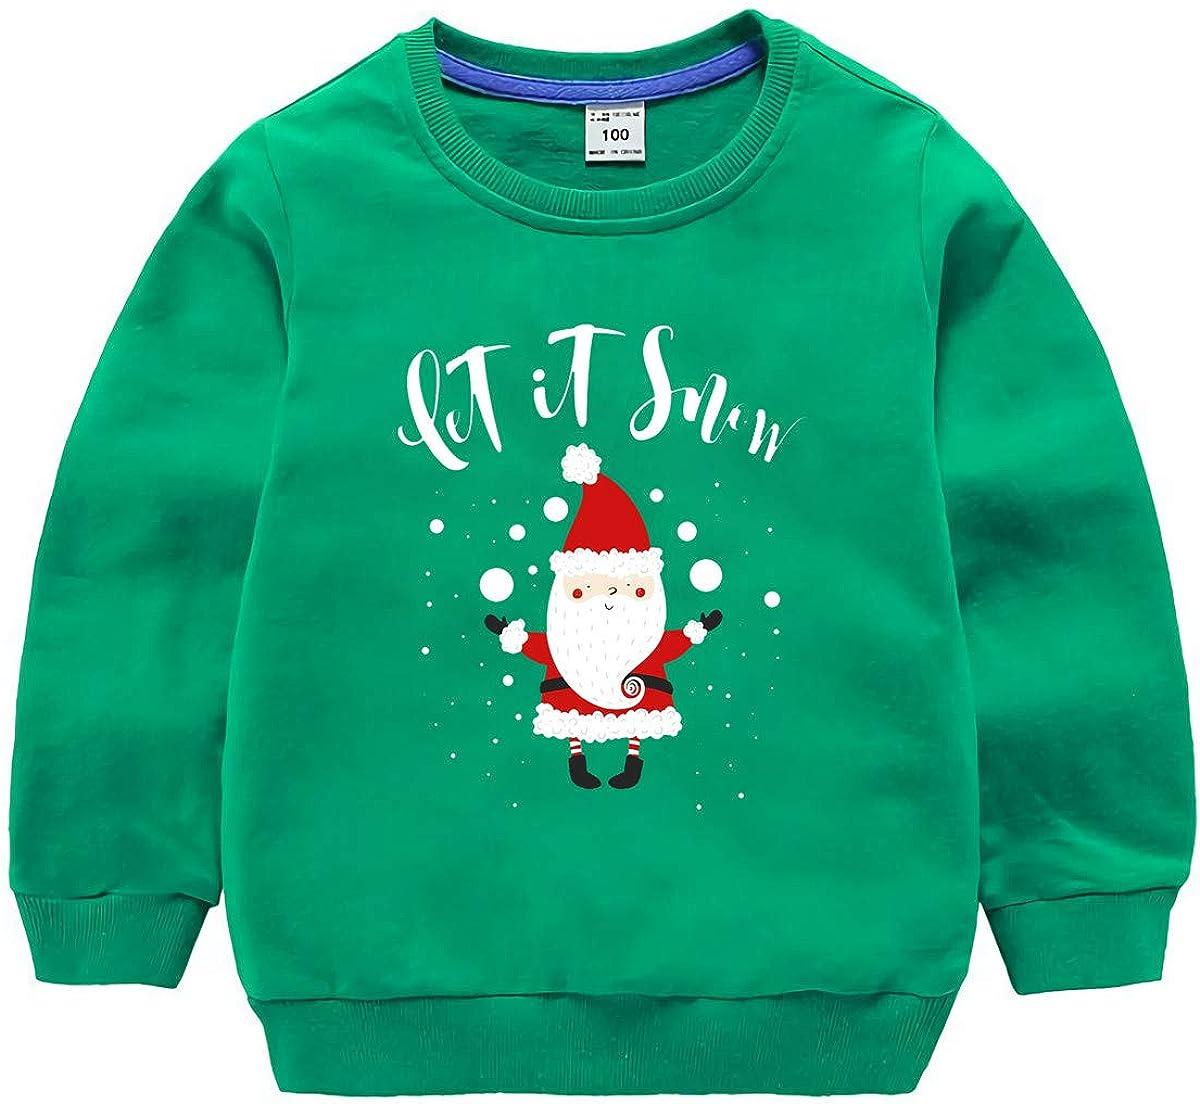 BesserBay Kids Christmas Ugly Sweatshirt Xmas Long Sleeve Funny Shirt 3-12 Years